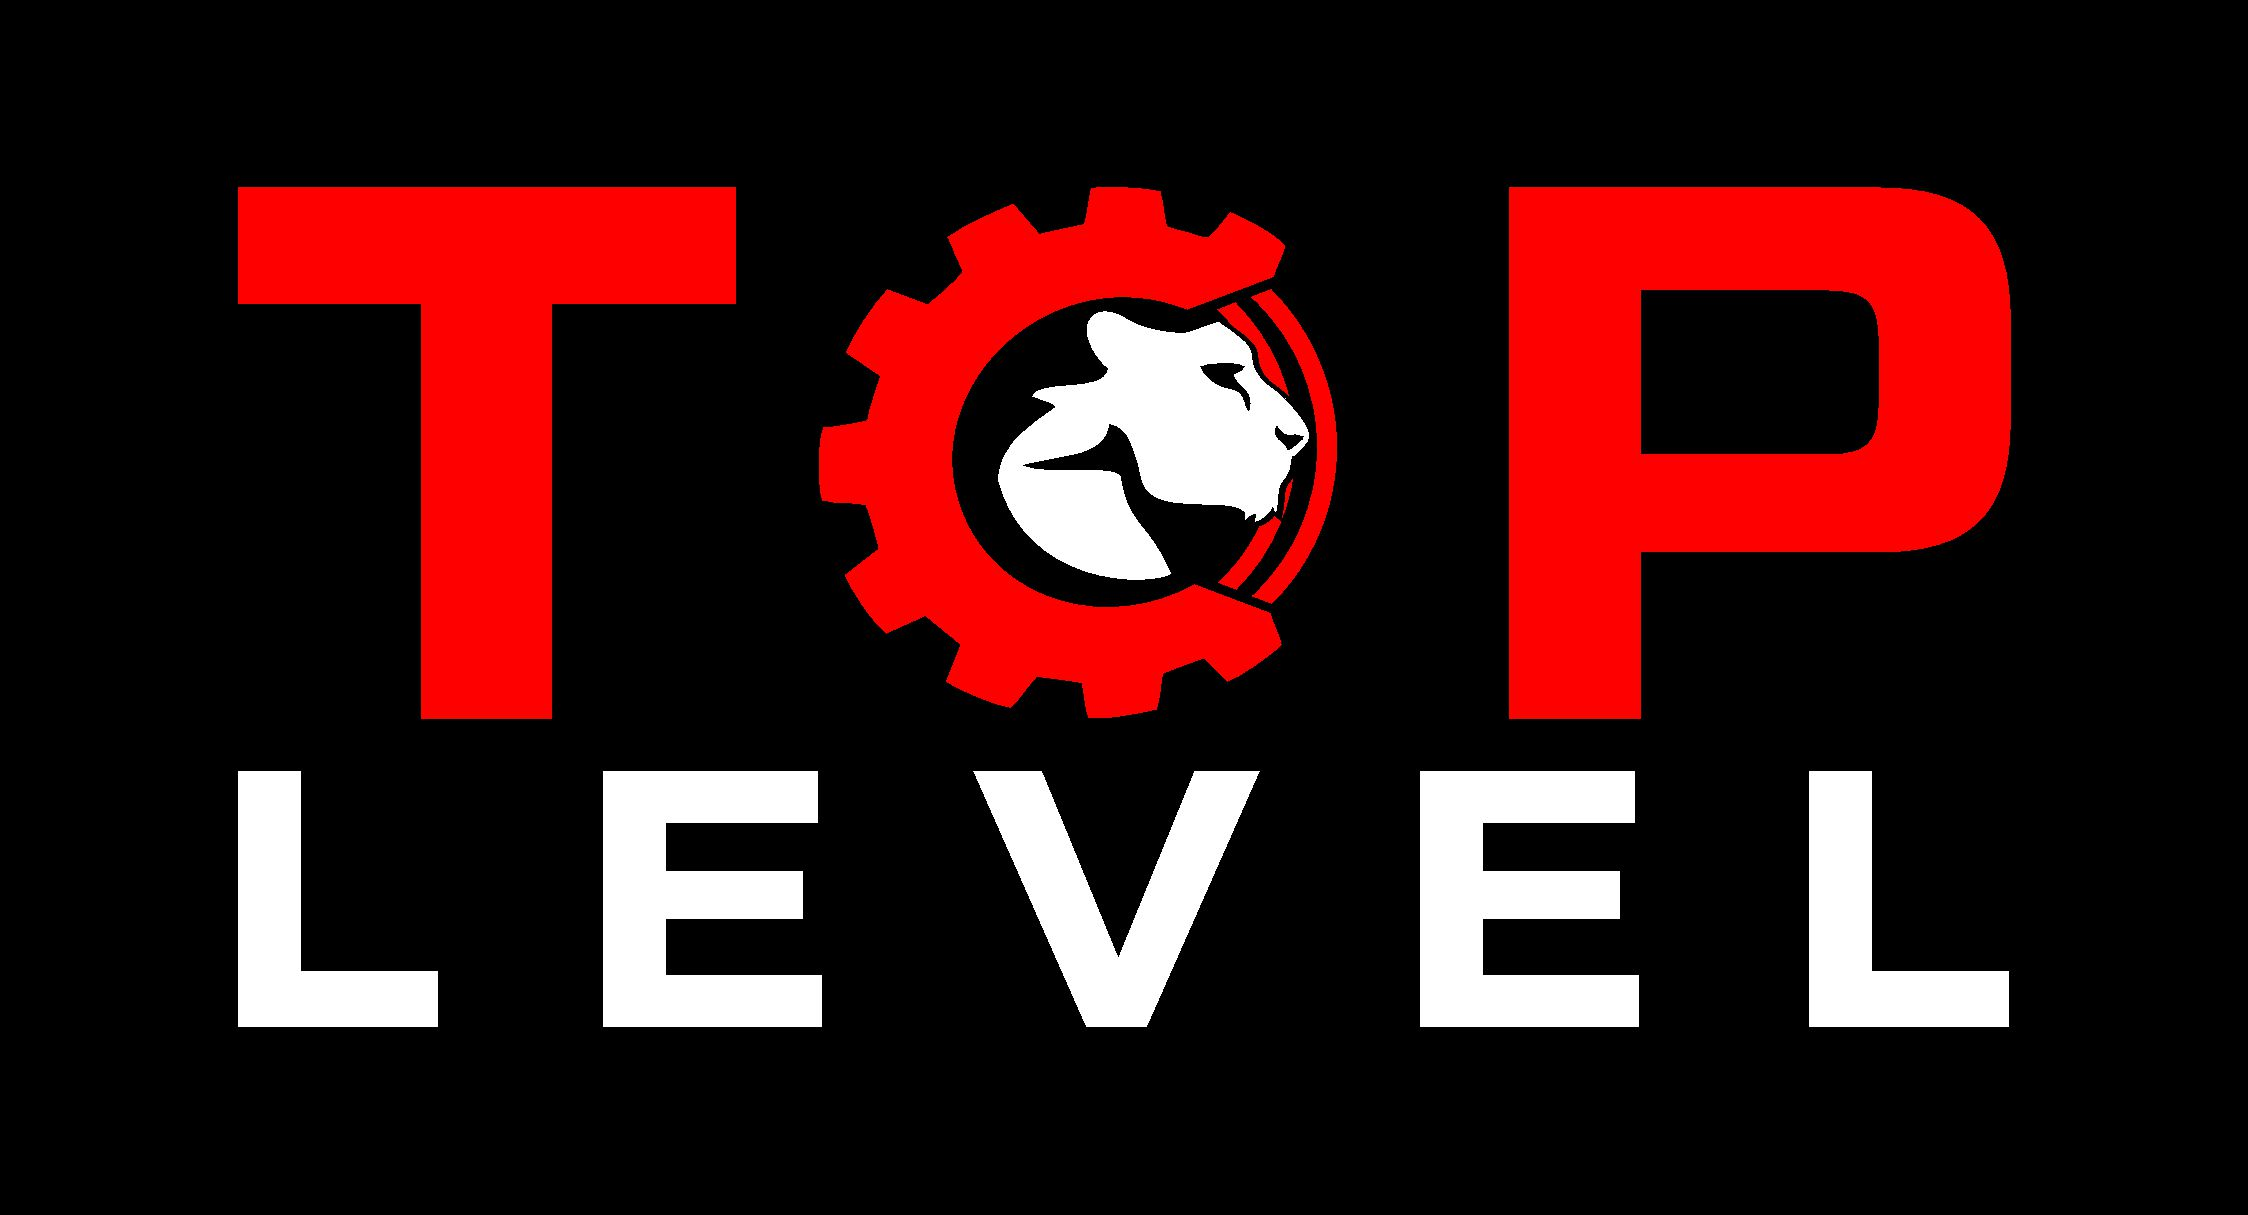 Разработка логотипа для тюнинг ателье фото f_6425f32ff6d98d67.jpg